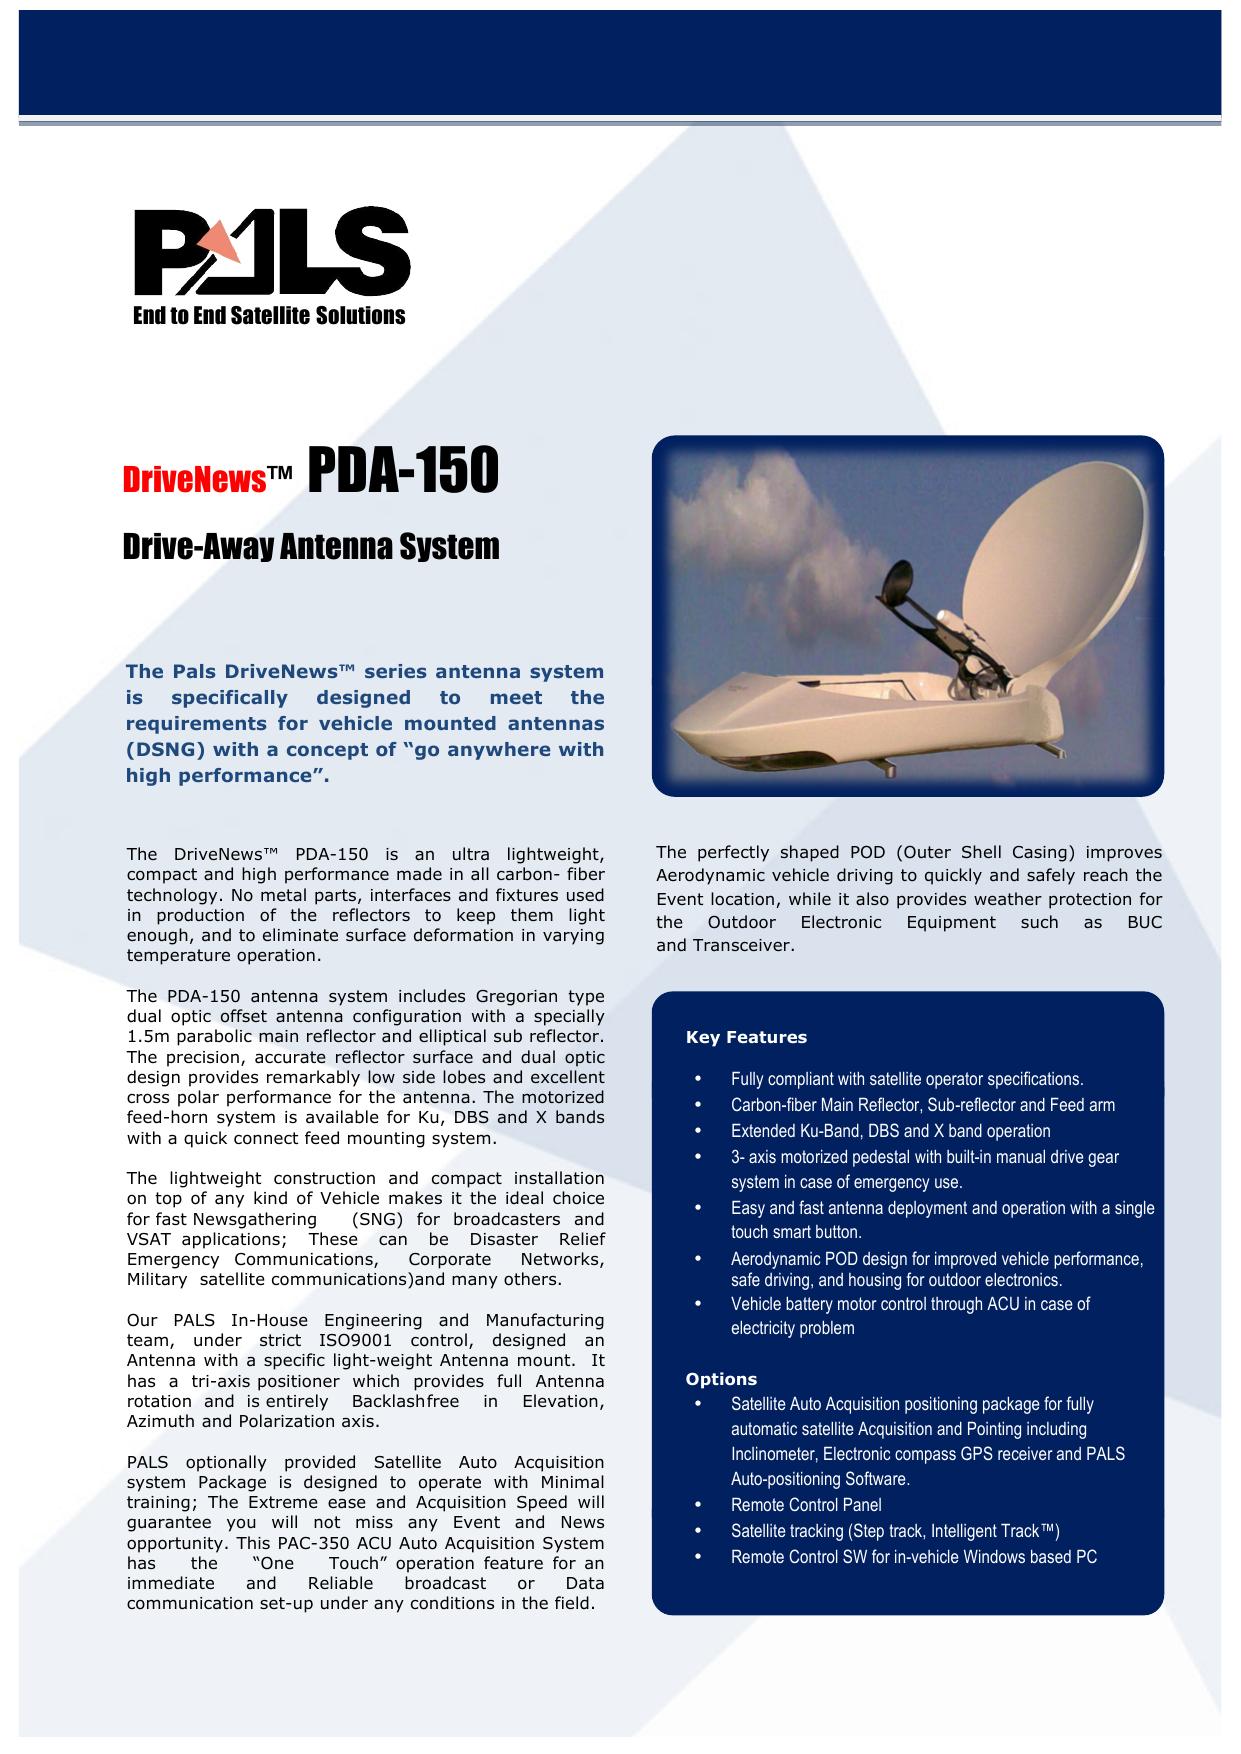 DriveNews™ PDA-150 Drive-Away Antenna System   manualzz com